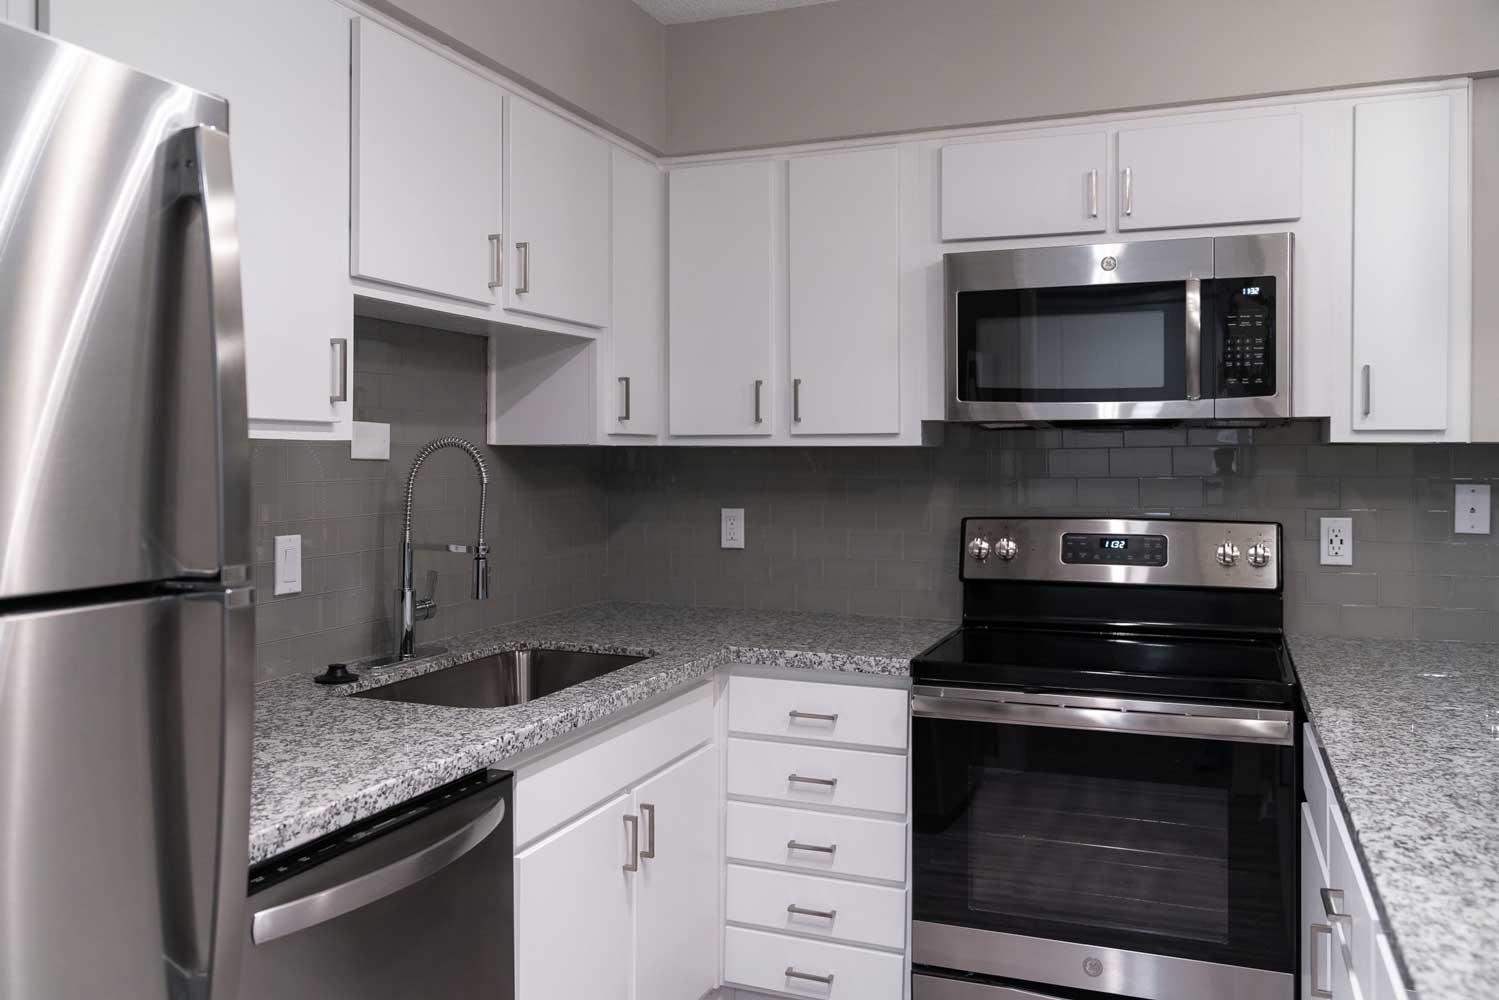 Newly Renovated Kitchens at View at Kessler Park Apartments in Dallas, TX